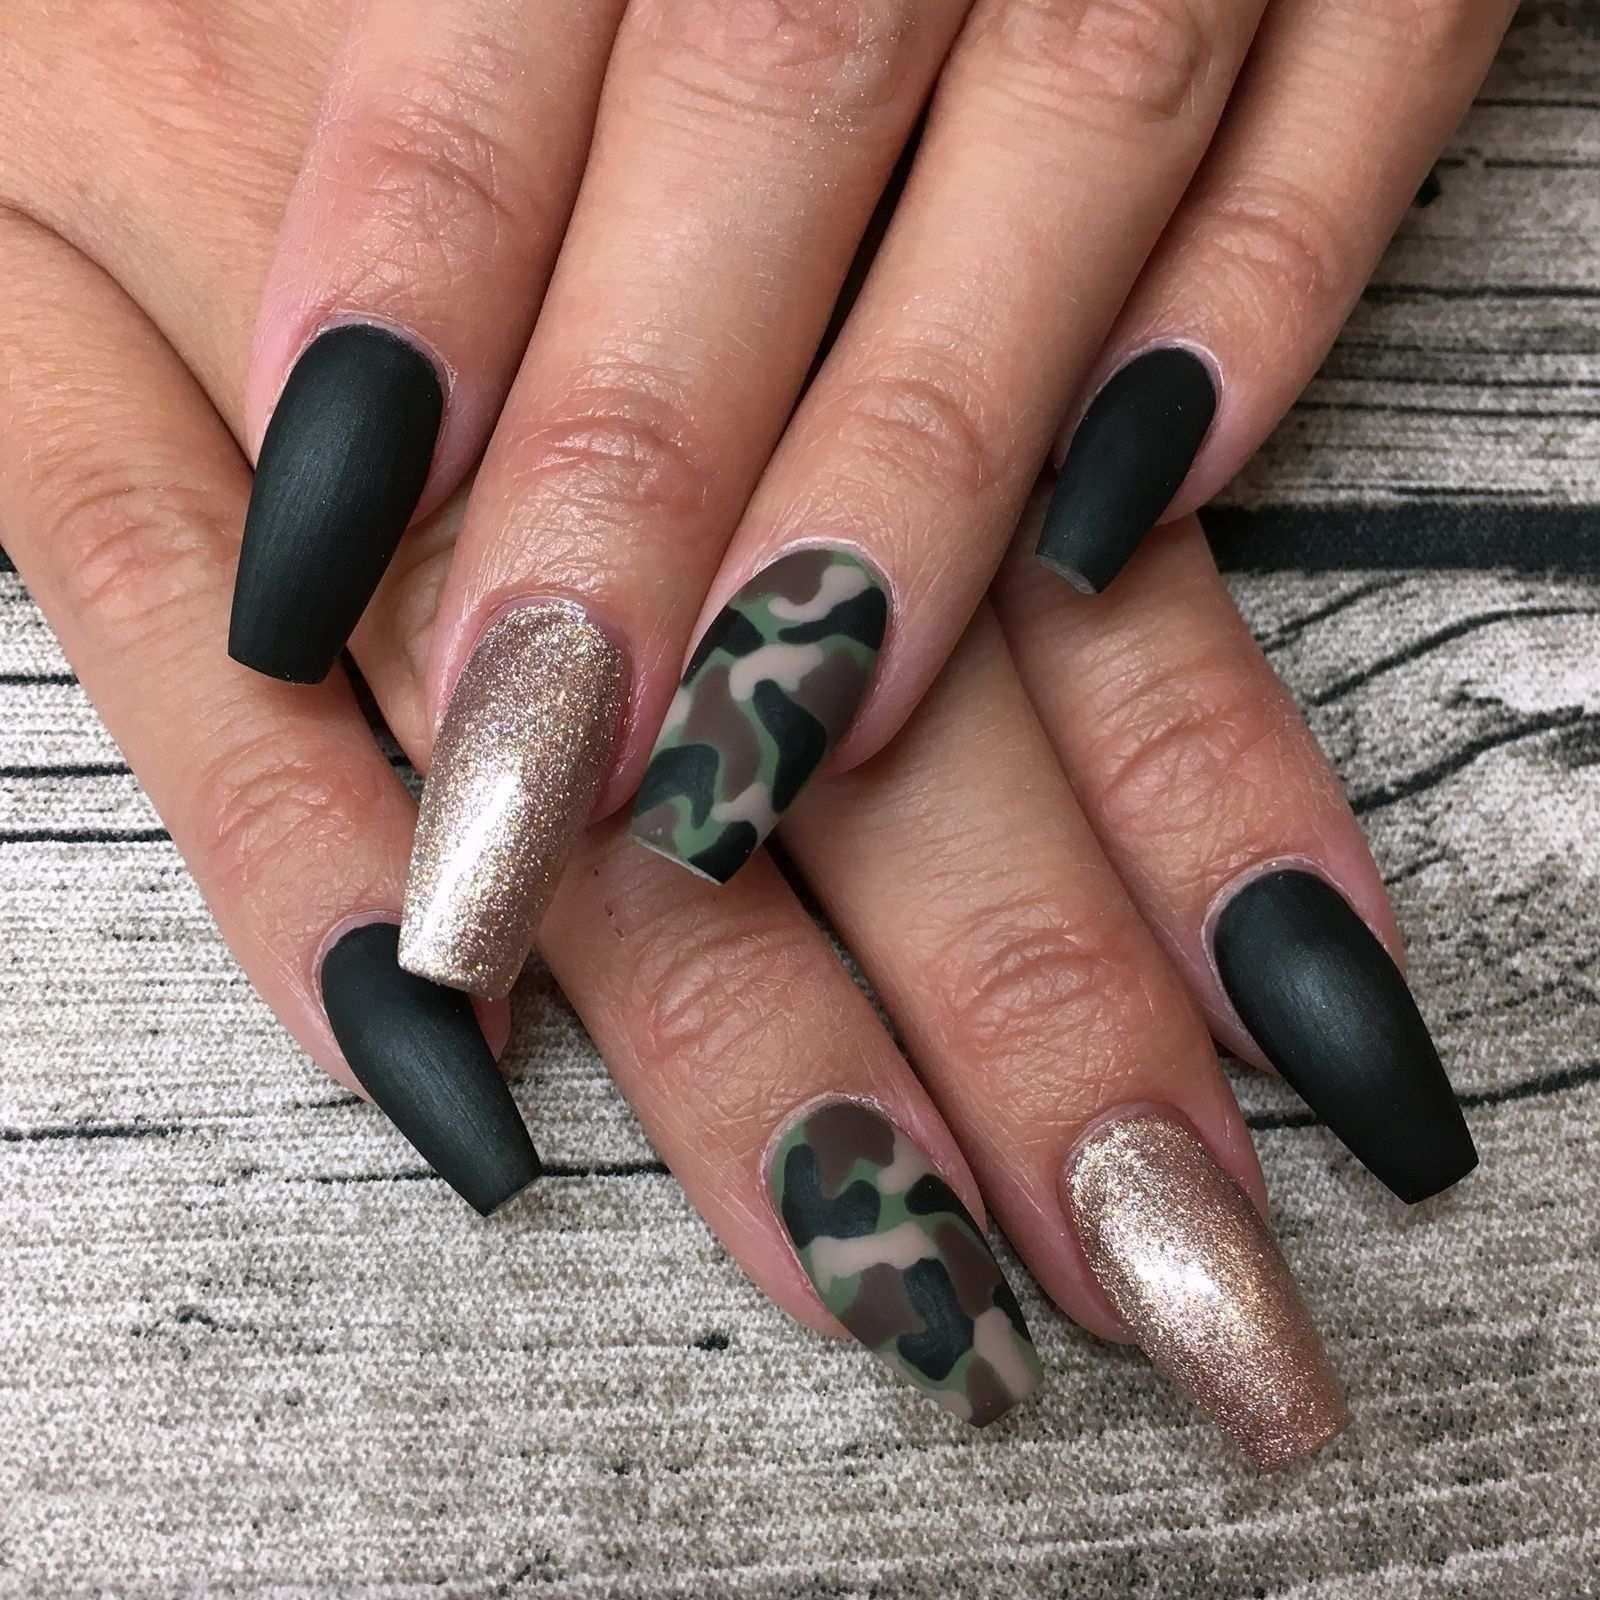 Nail Art Inspiration 1 Fashionladyloves Nagel Lackieren Muster Nagel Muster Herbst Nagel